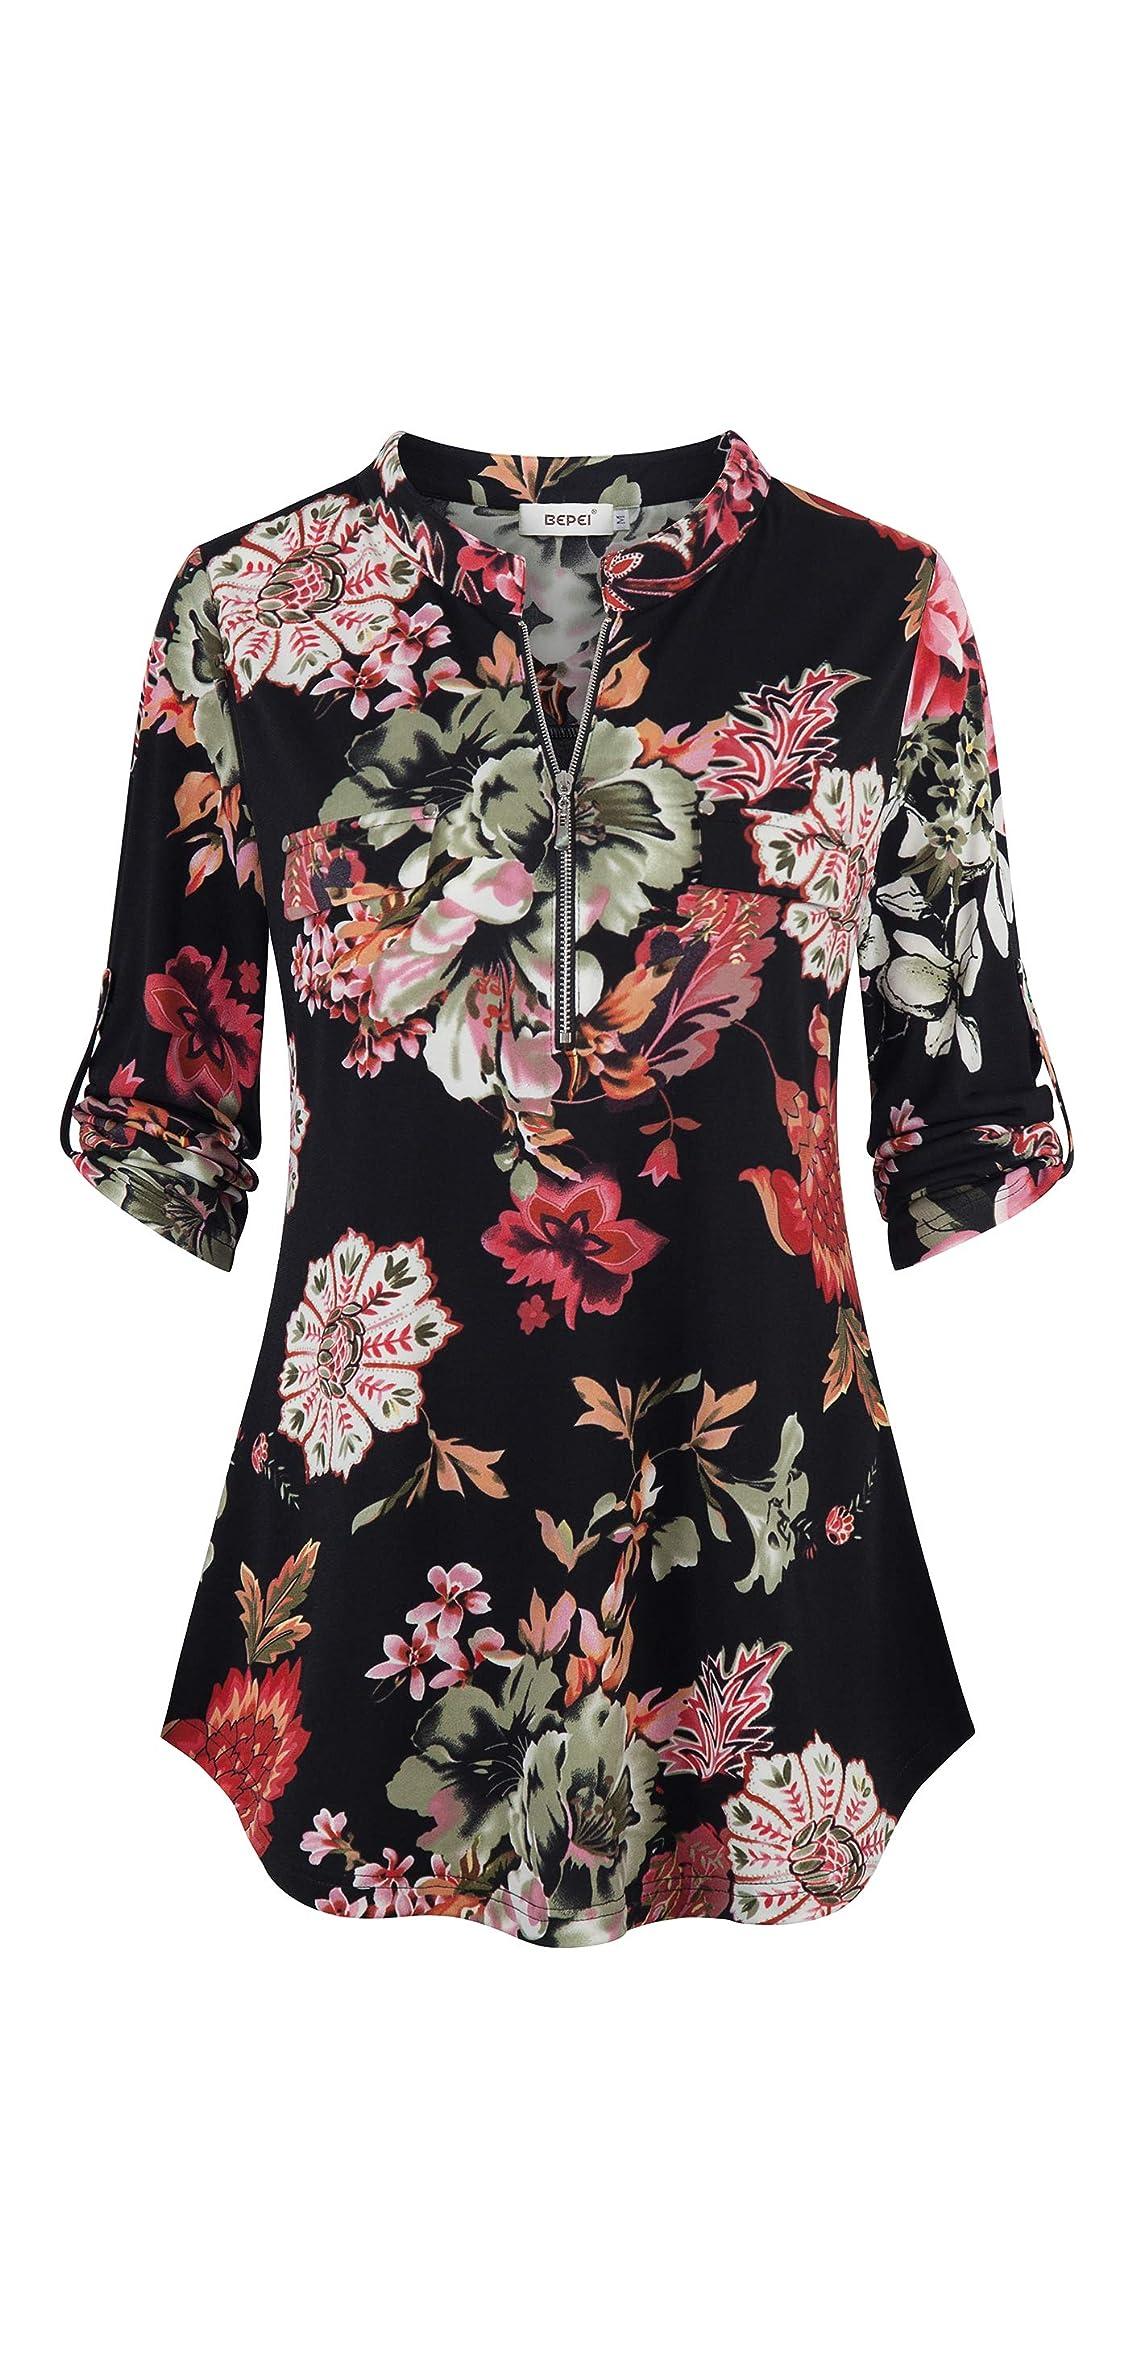 Womens Floral / Sleeve Shirts Zip Up V Neck Work Chiffon